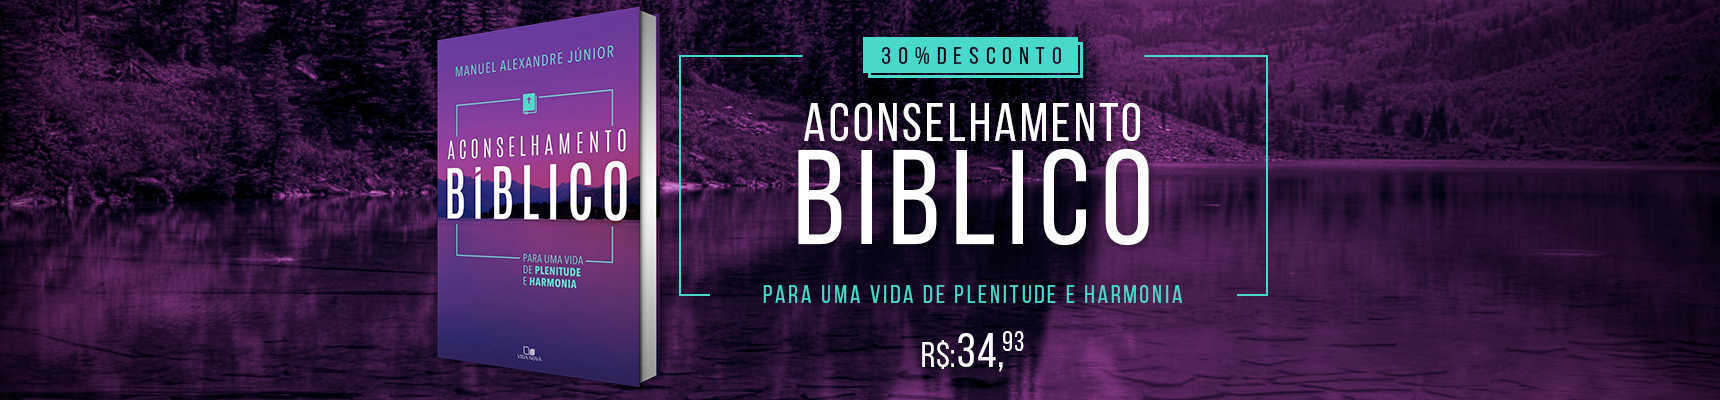 aconselhamento-biblico